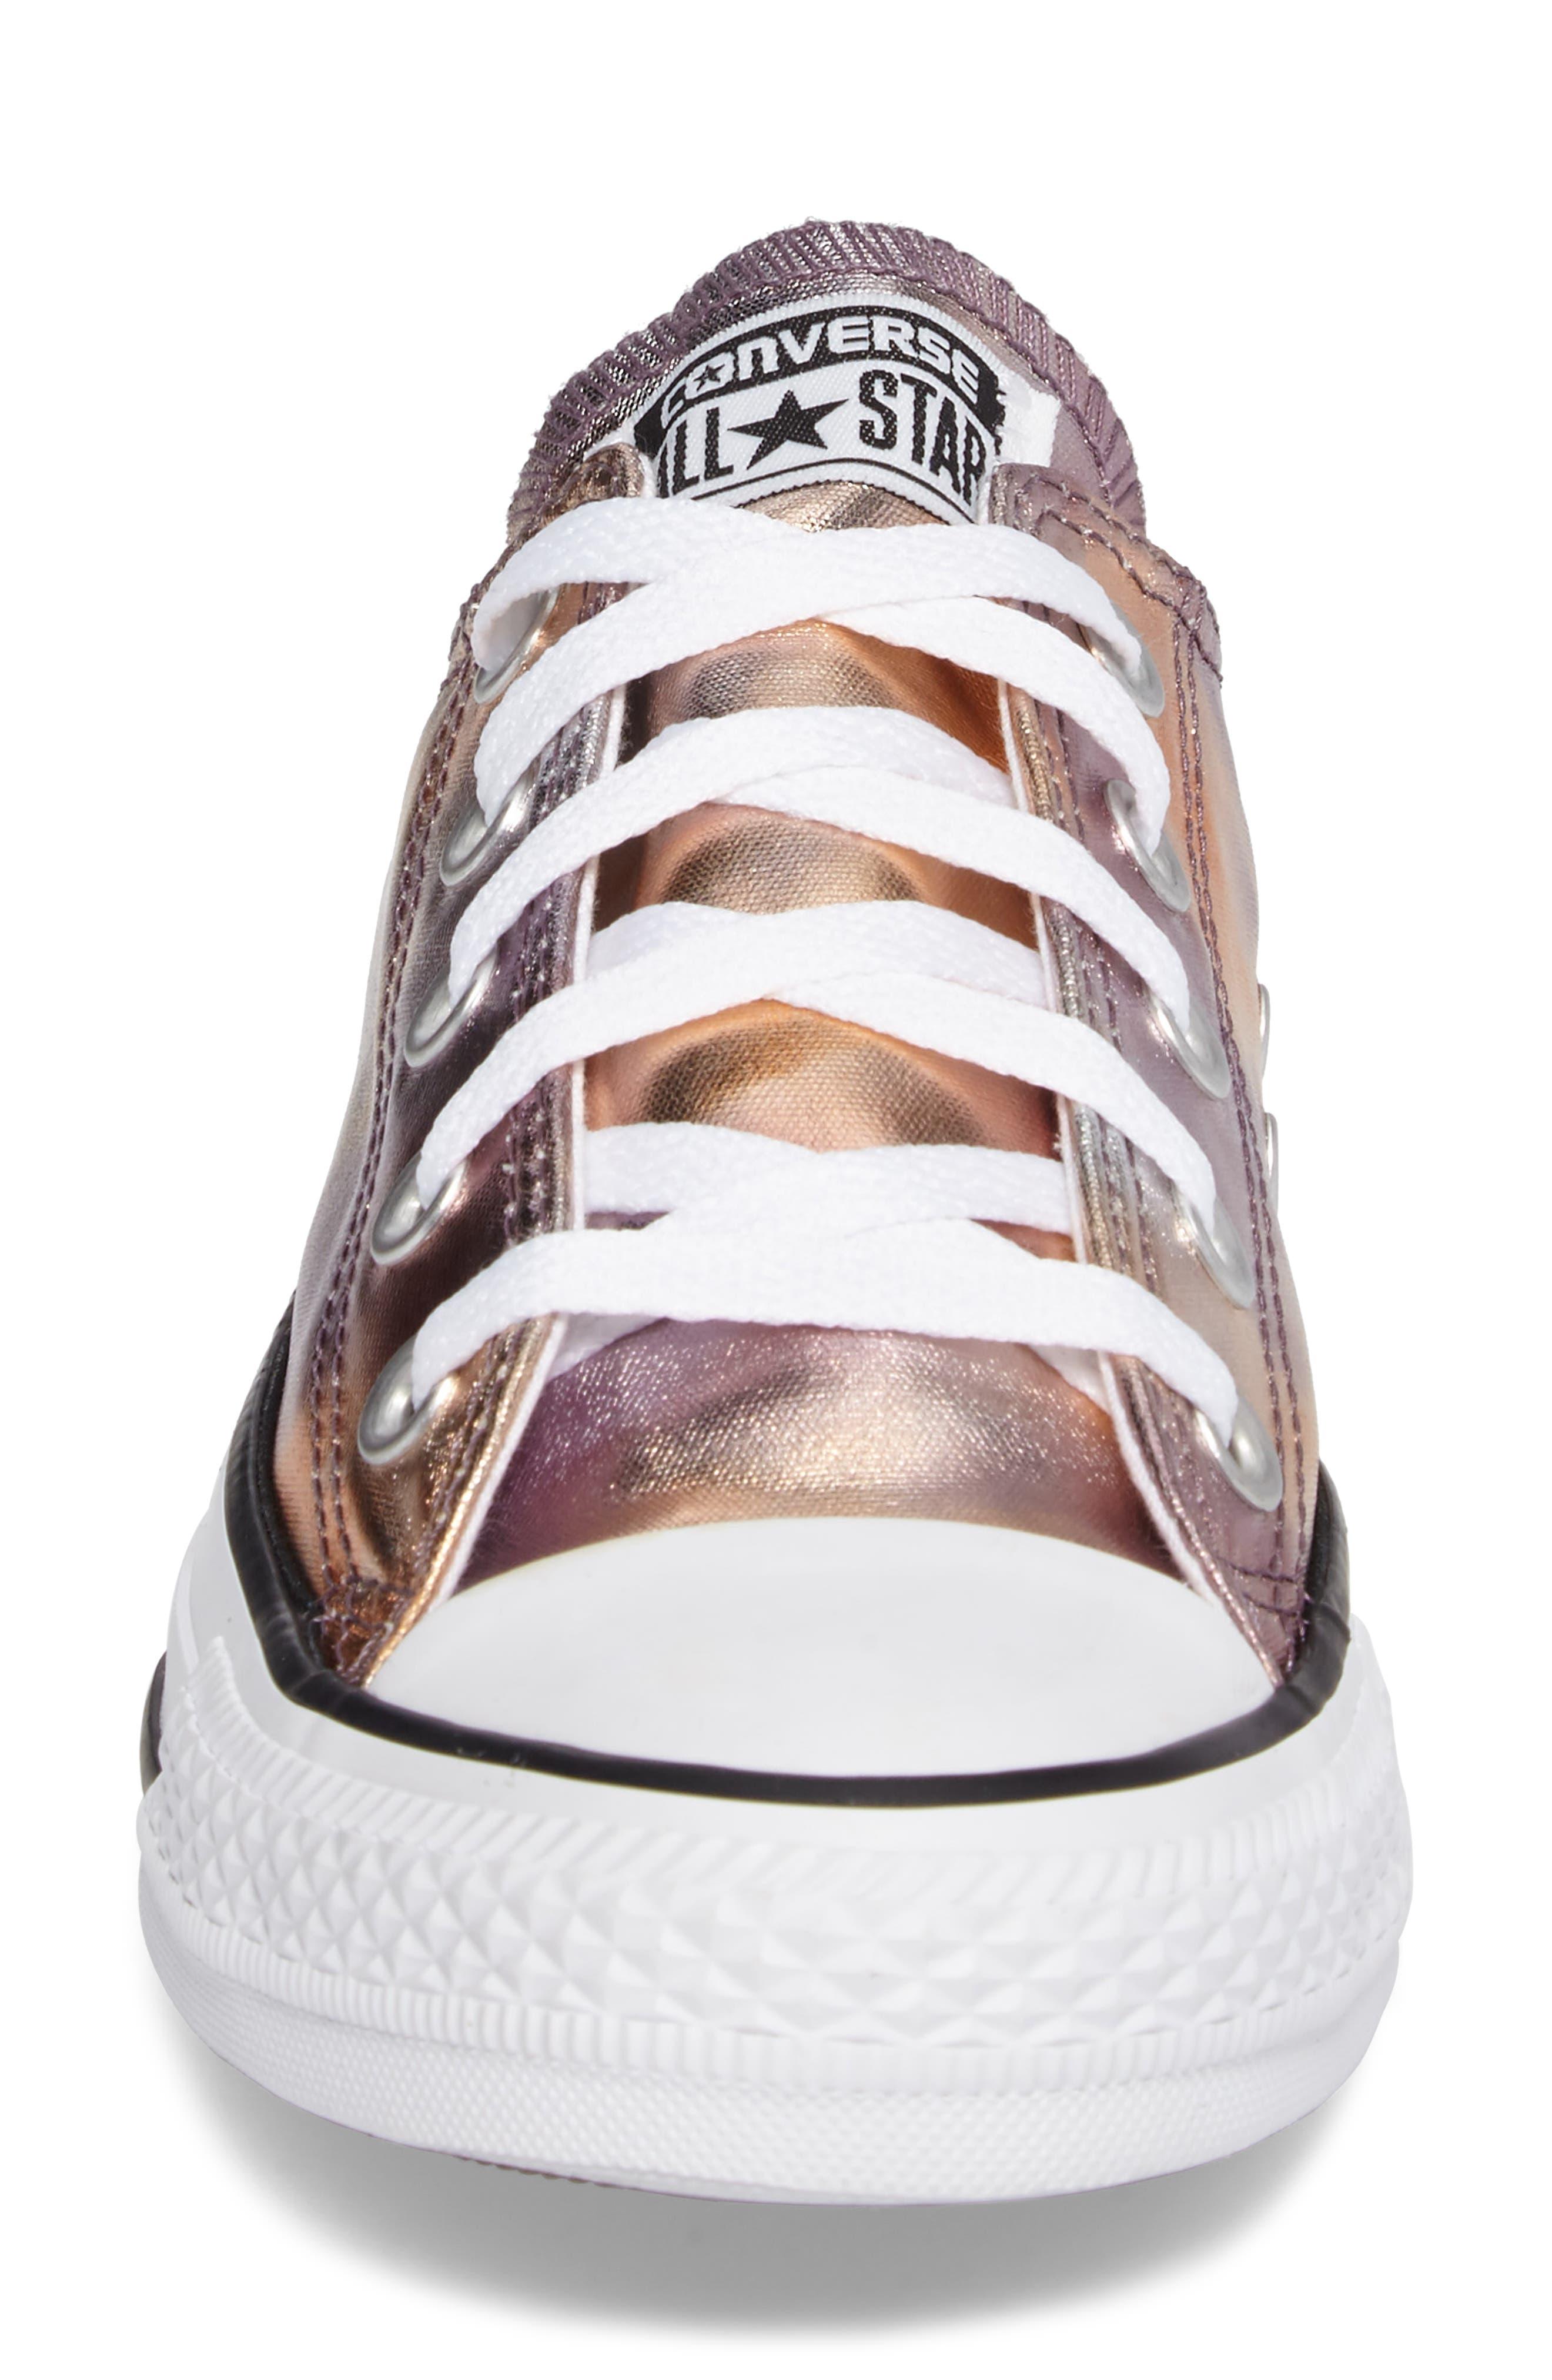 Chuck Taylor<sup>®</sup> All Star<sup>®</sup> Seasonal Metallic Ox Low Top Sneaker,                             Alternate thumbnail 4, color,                             Dusk Pink